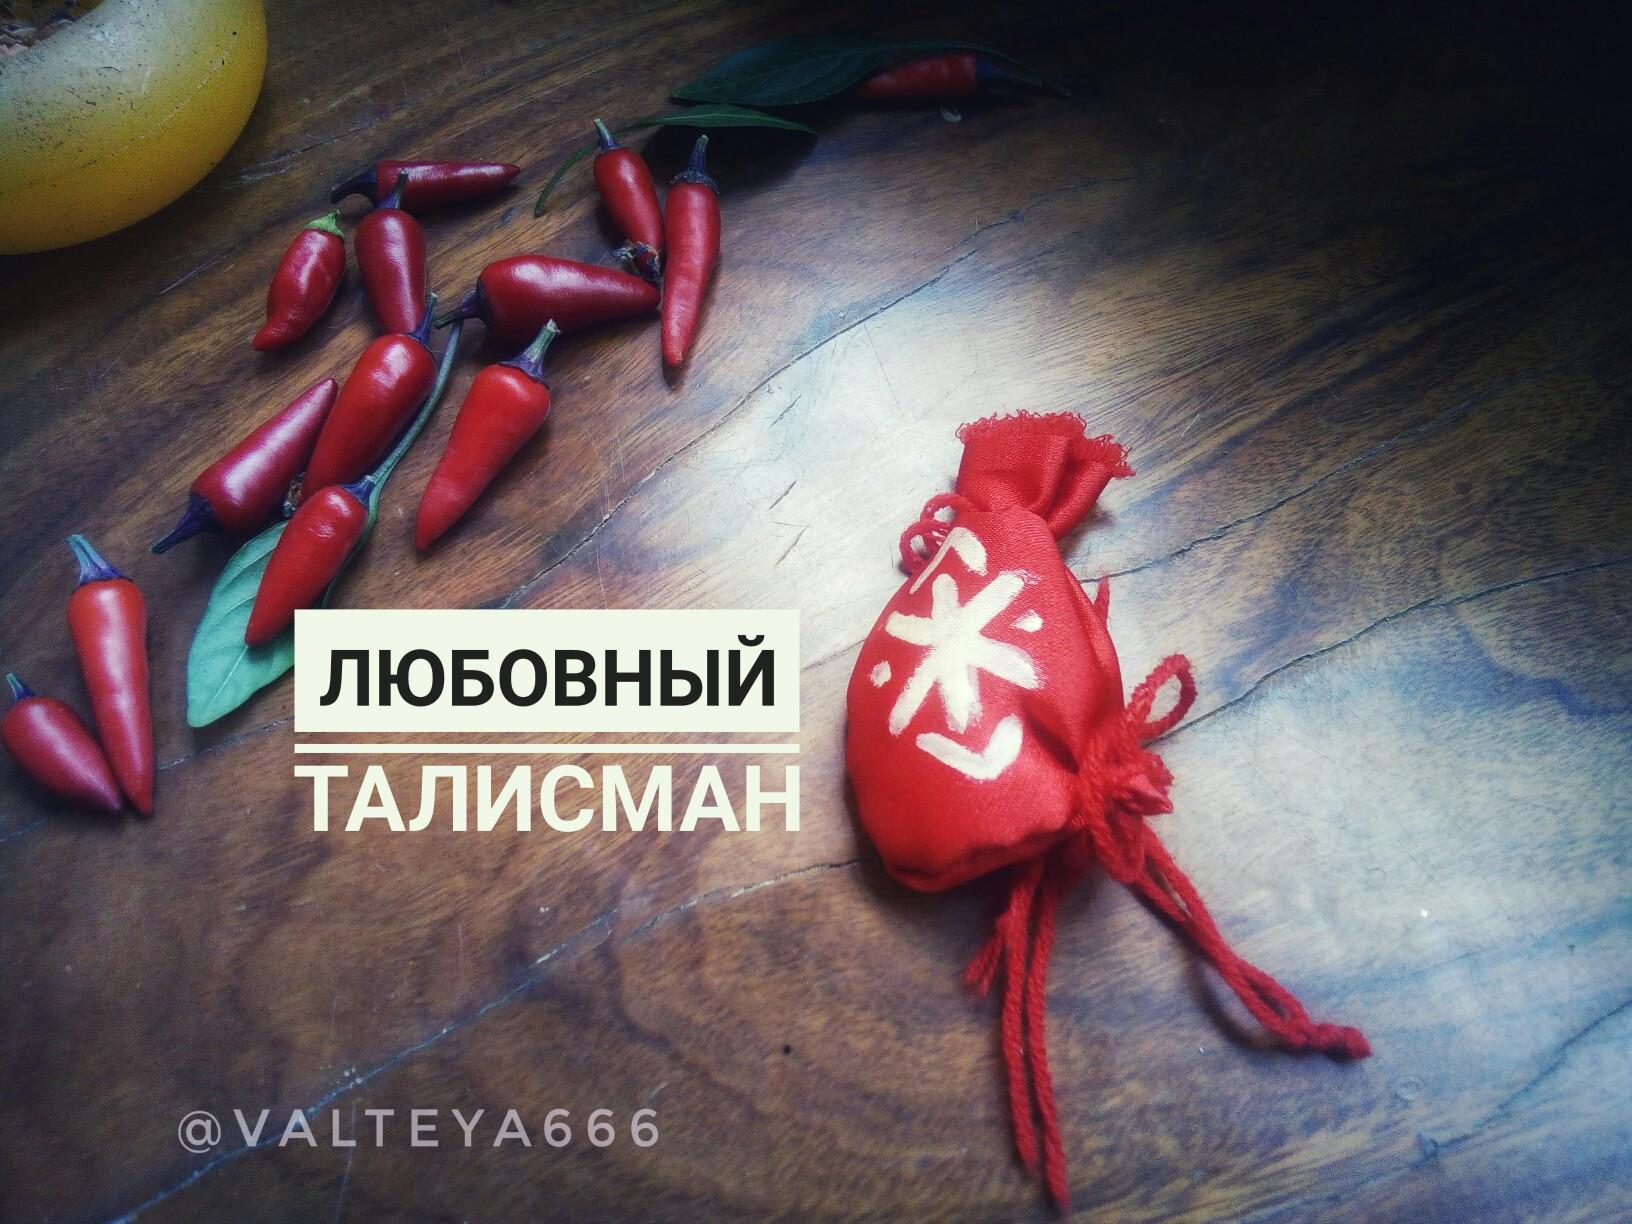 Хештег секс на   Салон Магии и мистики Елены Руденко ( Валтеи ). Киев ,тел: 0506251562  H9vkILsVCPU